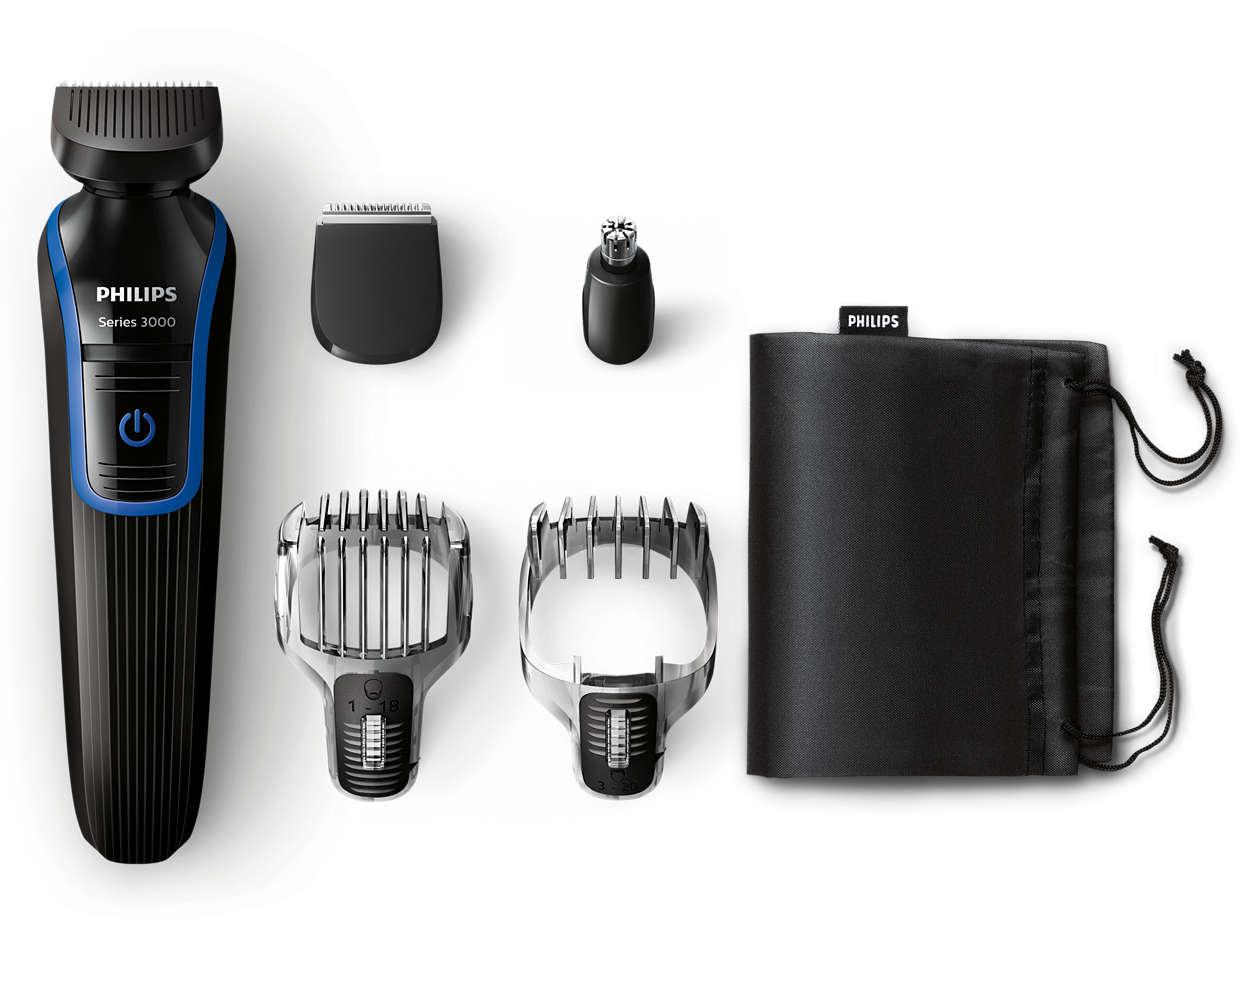 multigroom series 3000 tondeuse barbe et cheveux 5 en 1 qg3330 15 philips. Black Bedroom Furniture Sets. Home Design Ideas